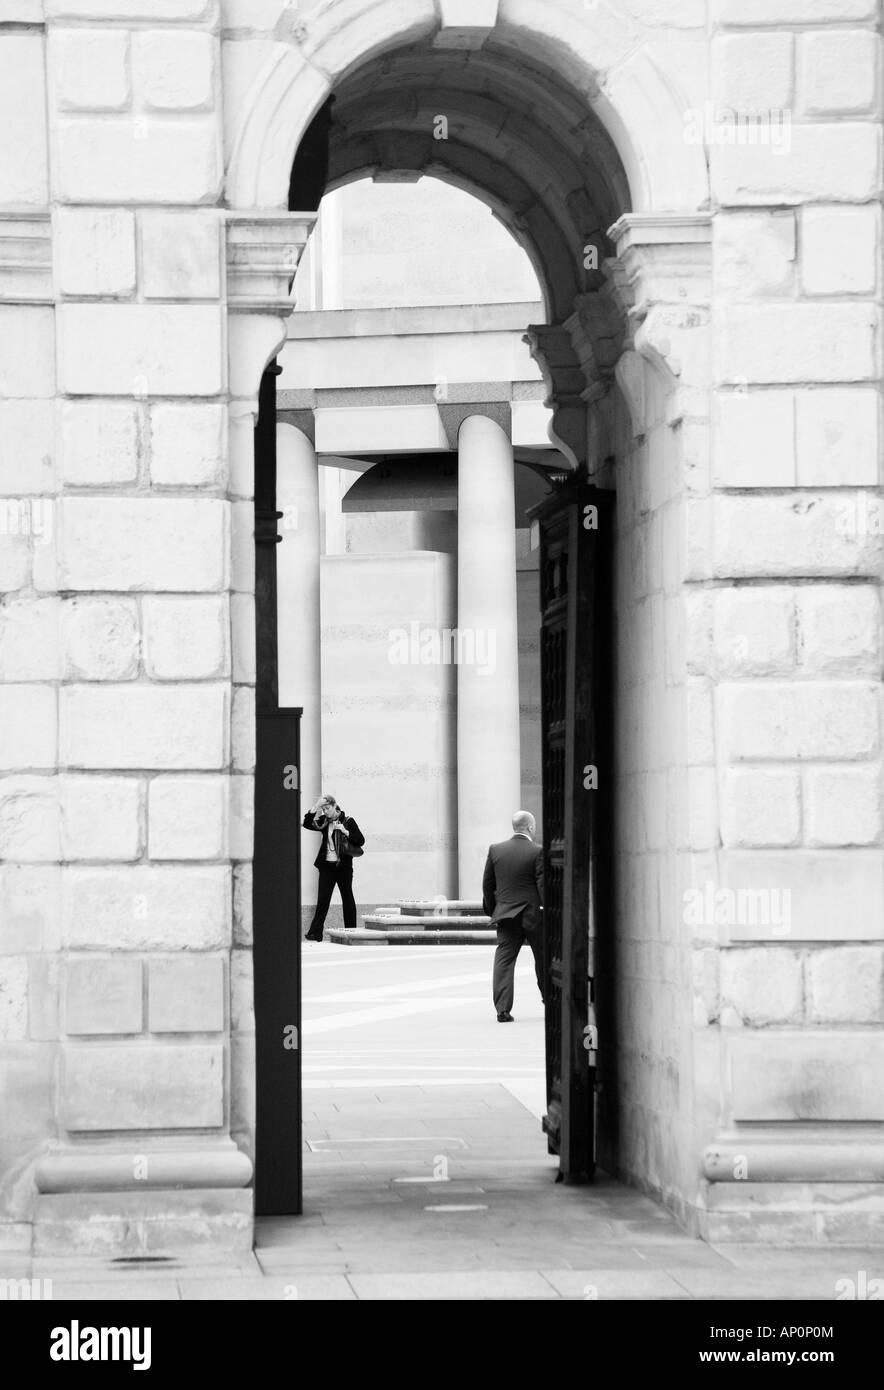 Narrow Stone Archway London England United Kingdom - Stock Image